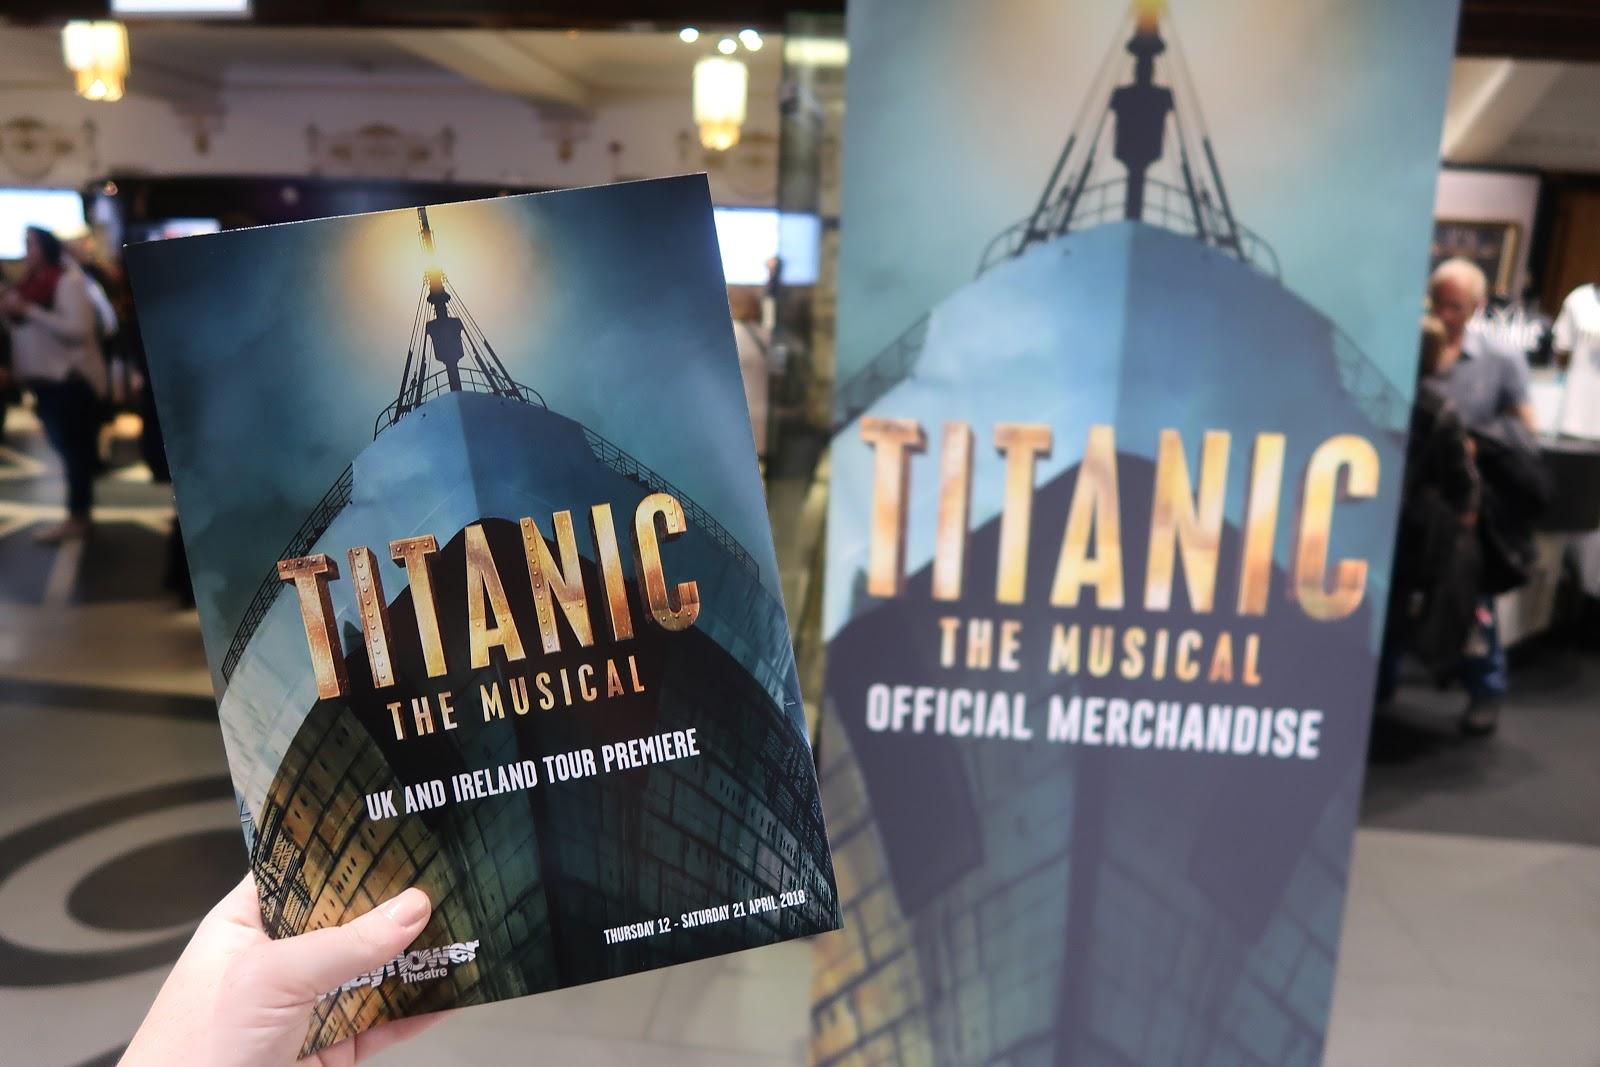 Titanic The Musical Mayflower Southampton Brogan Tate Xo